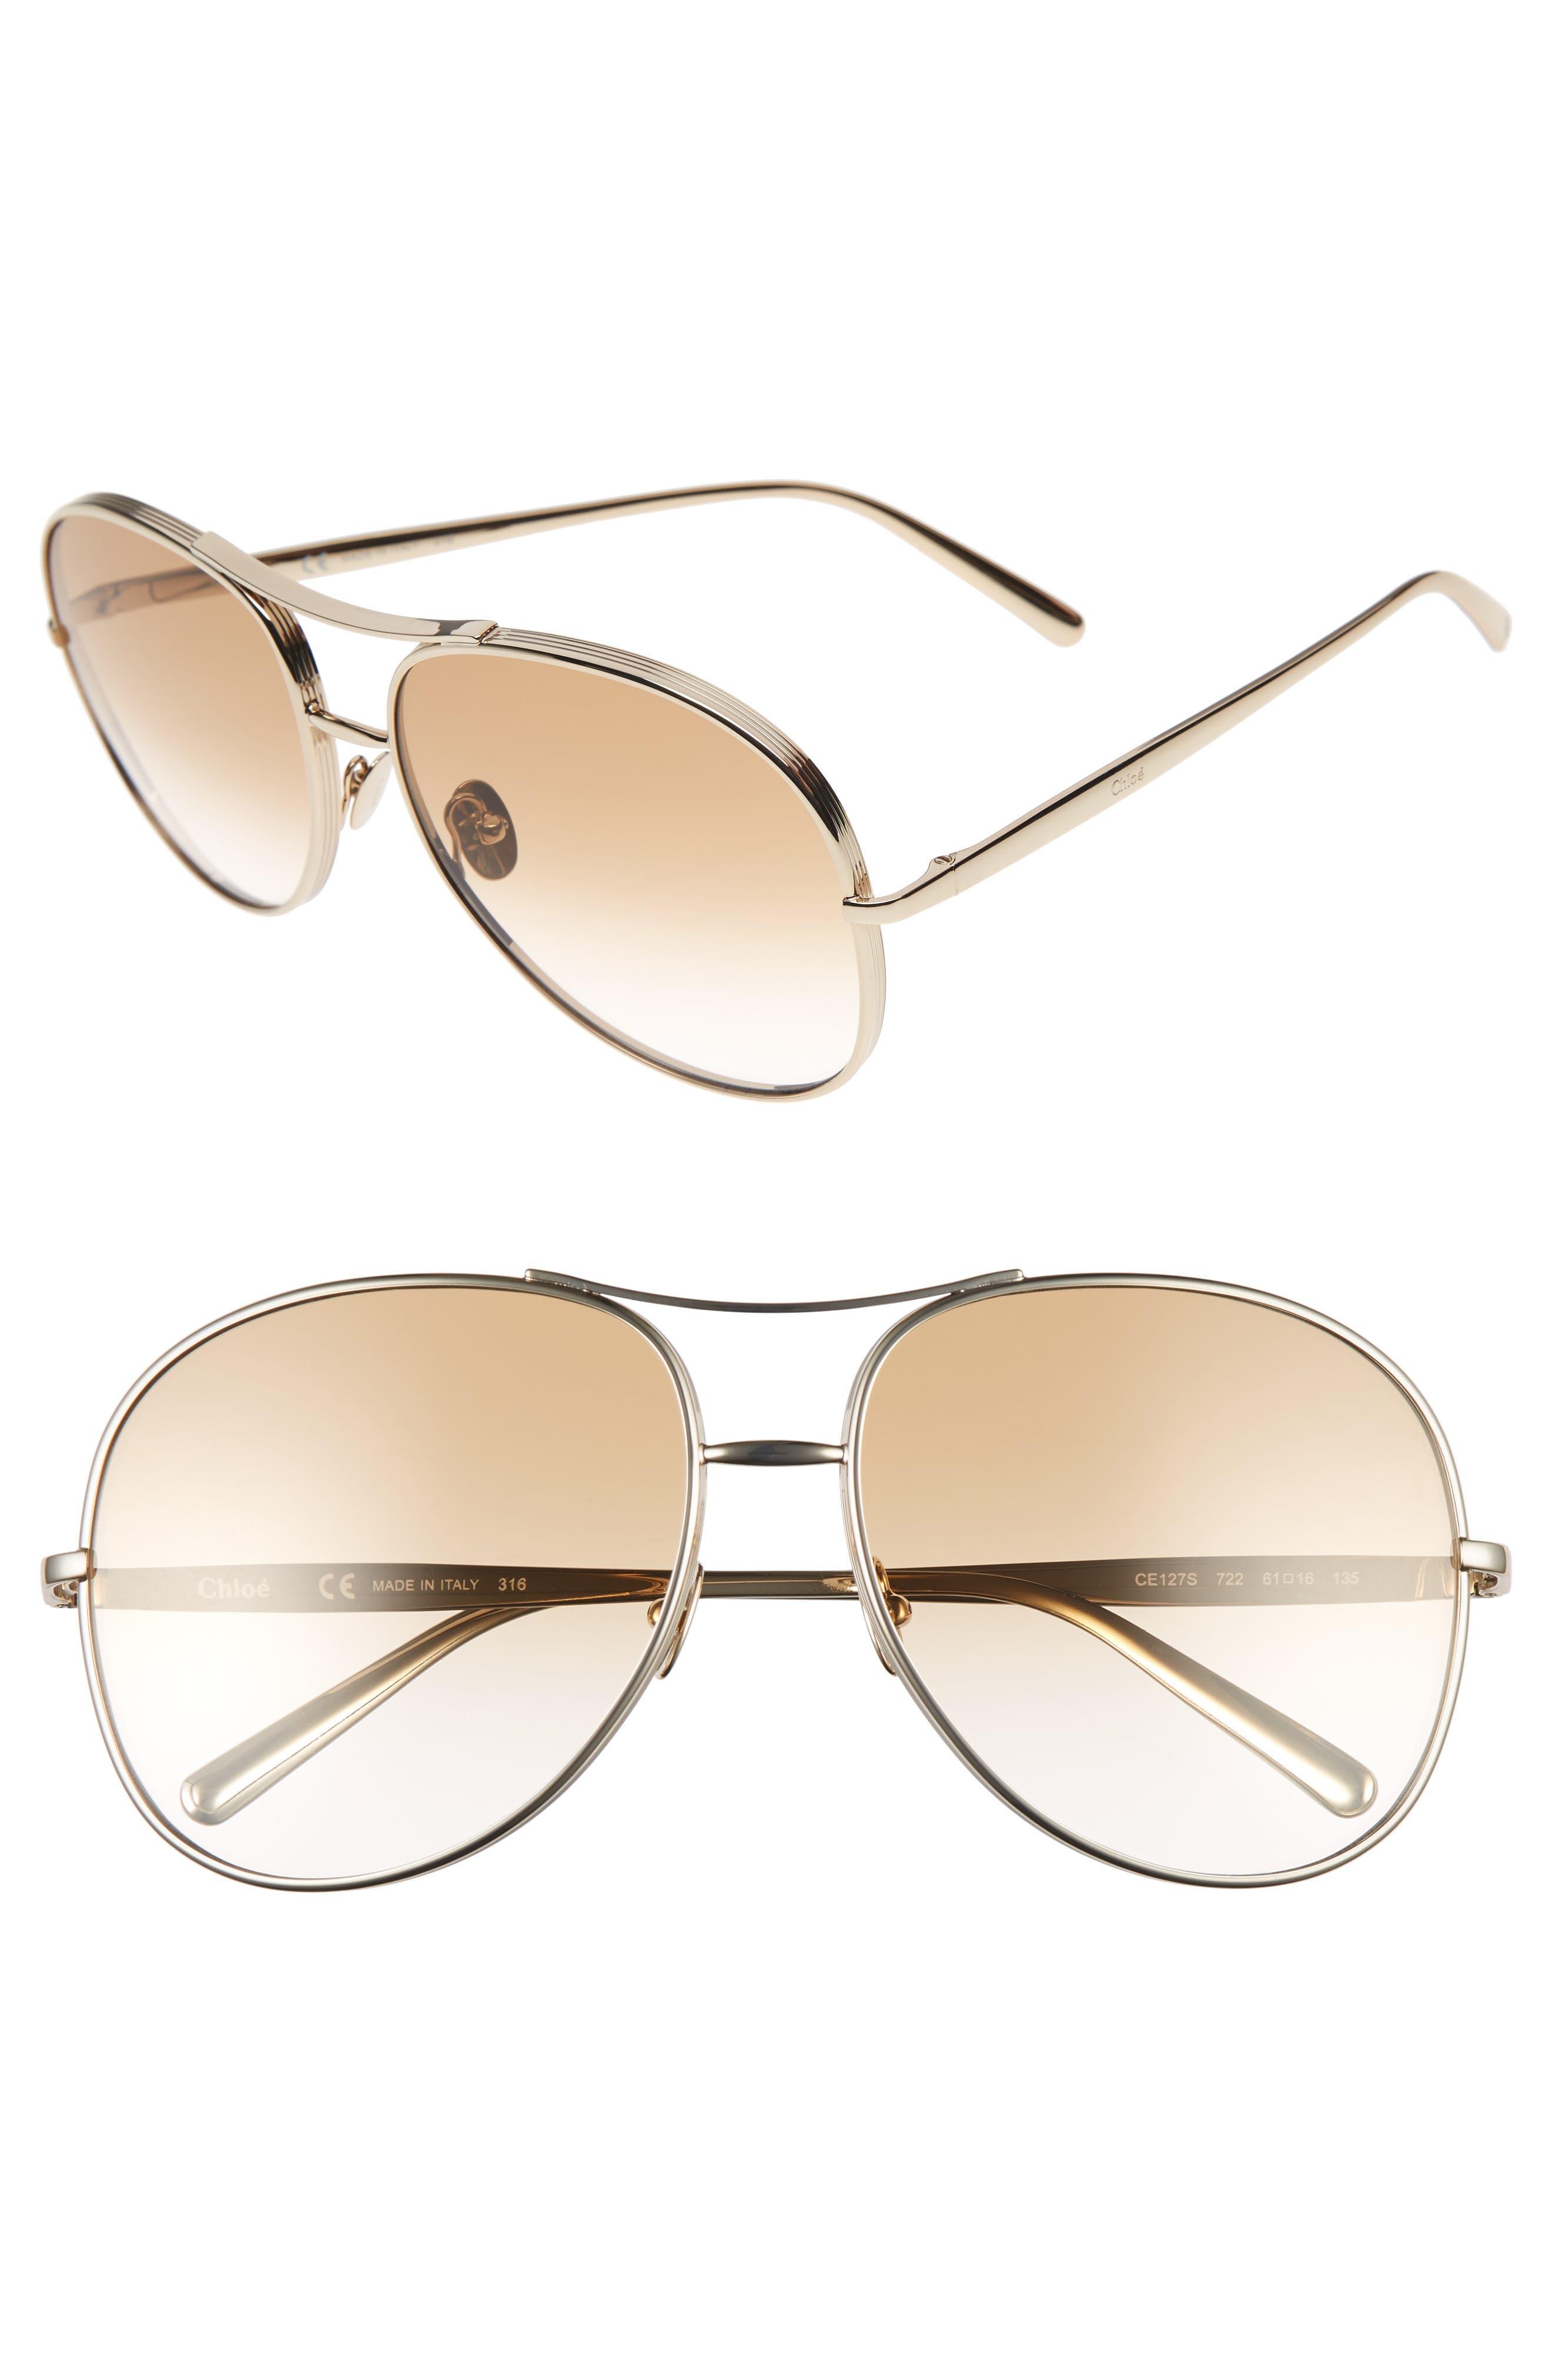 61mm Oversize Sunglasses,                             Main thumbnail 2, color,